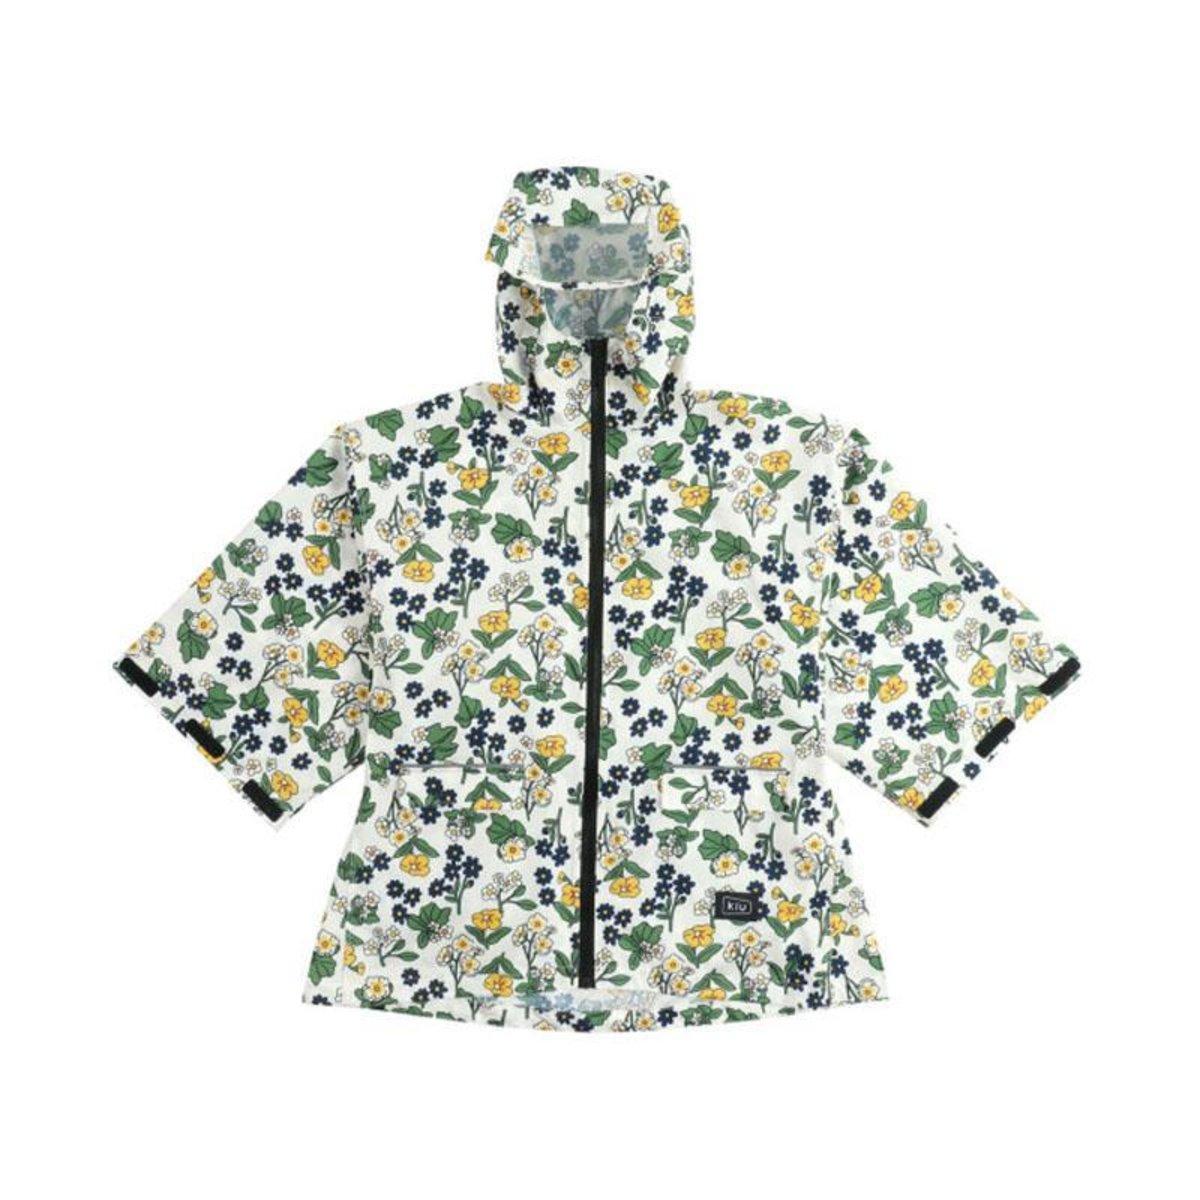 KiU children's raincoats Japanese brands - flowers FLORA OFF